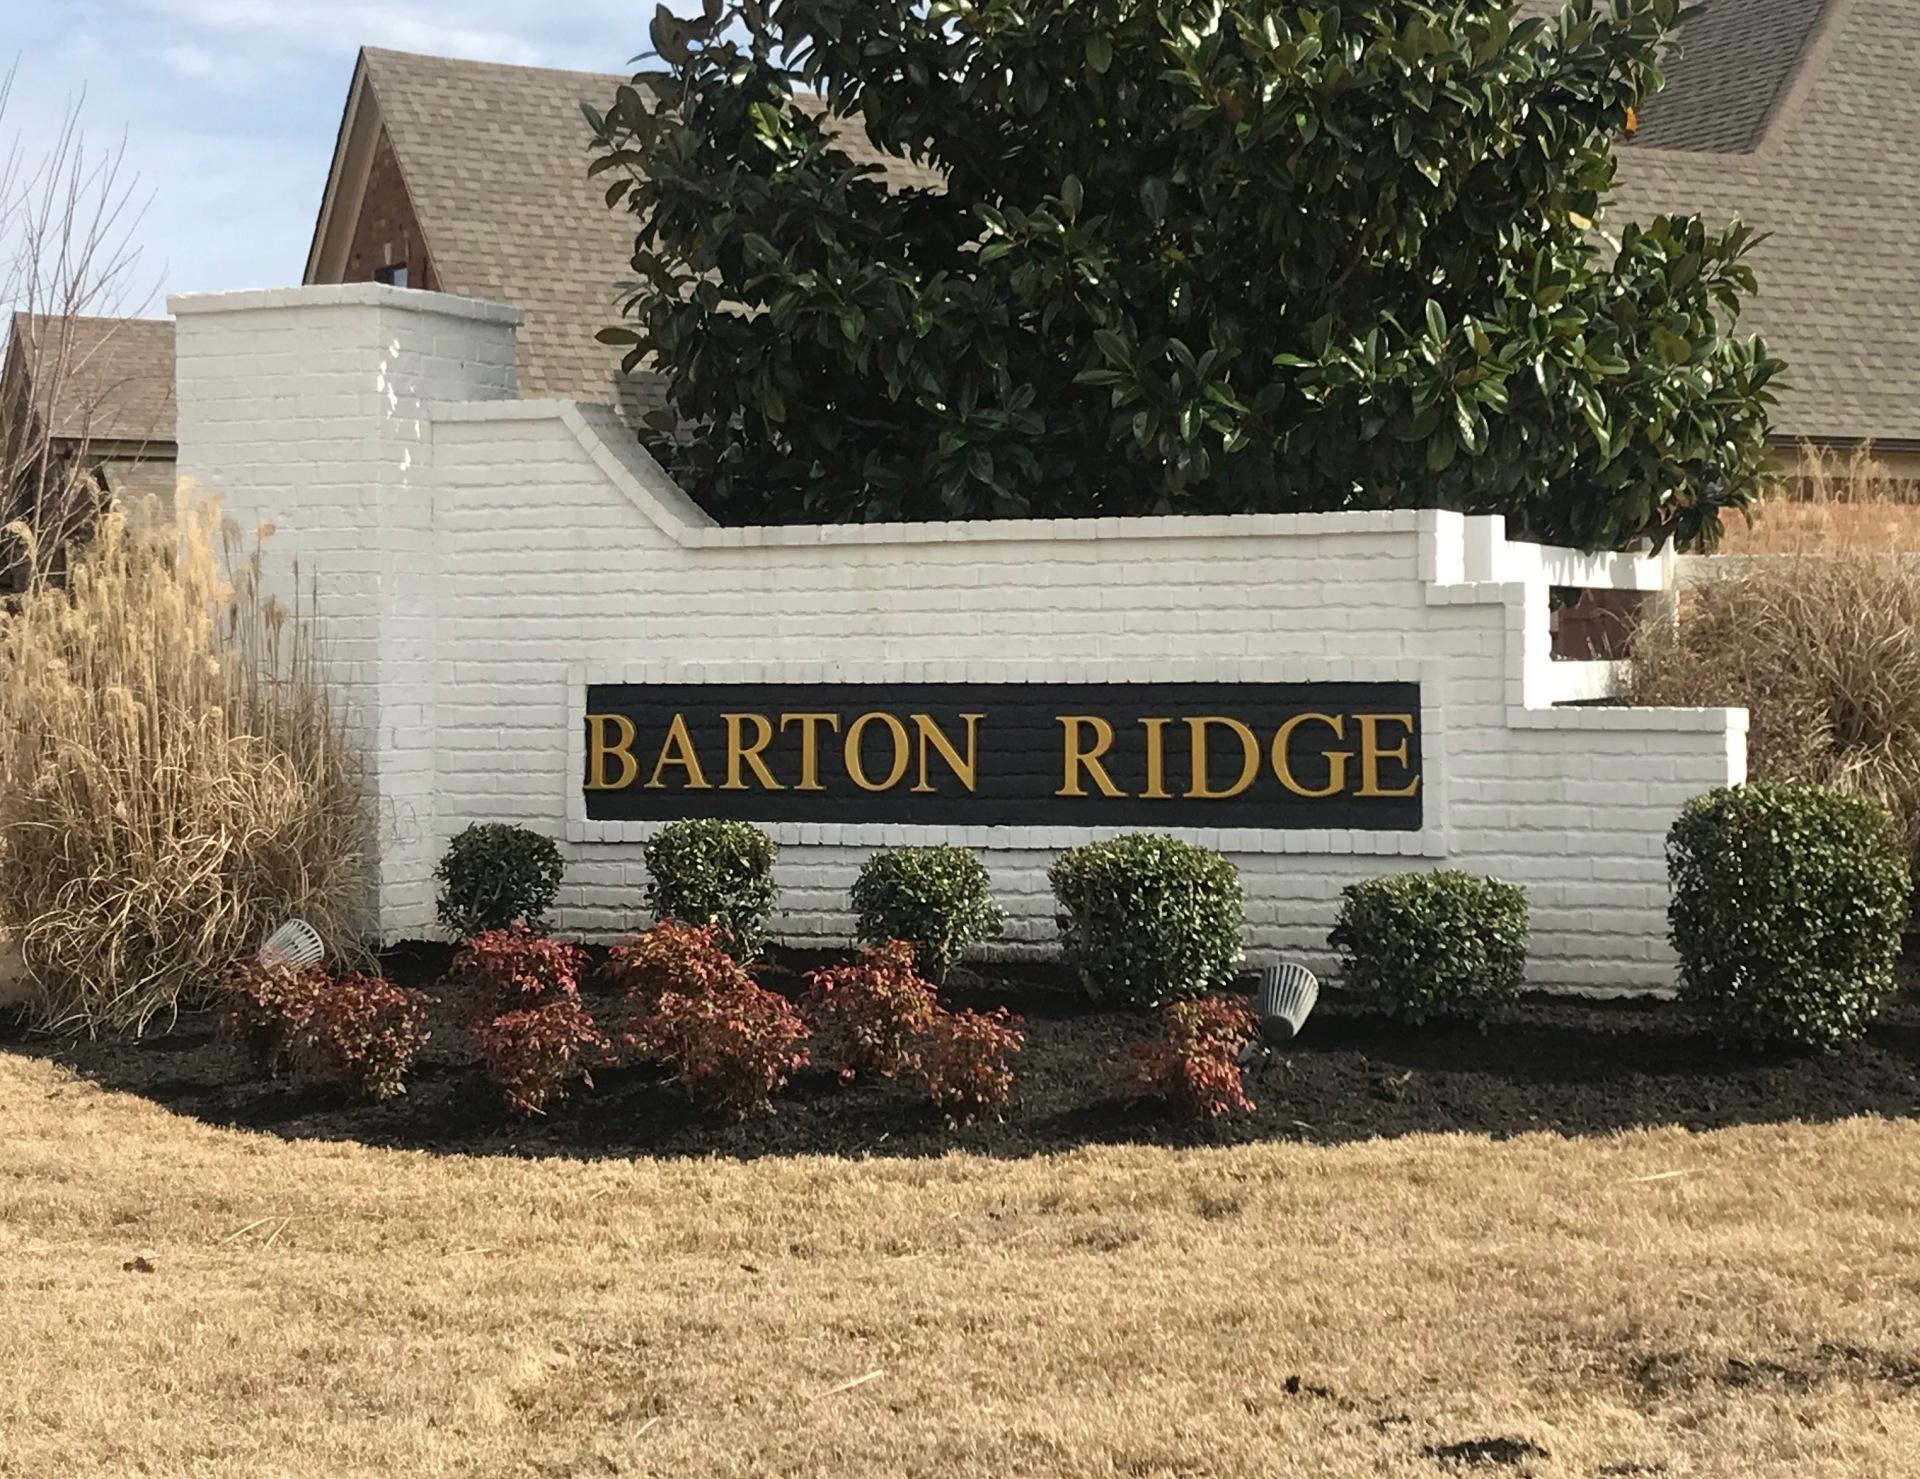 Barton Ridge